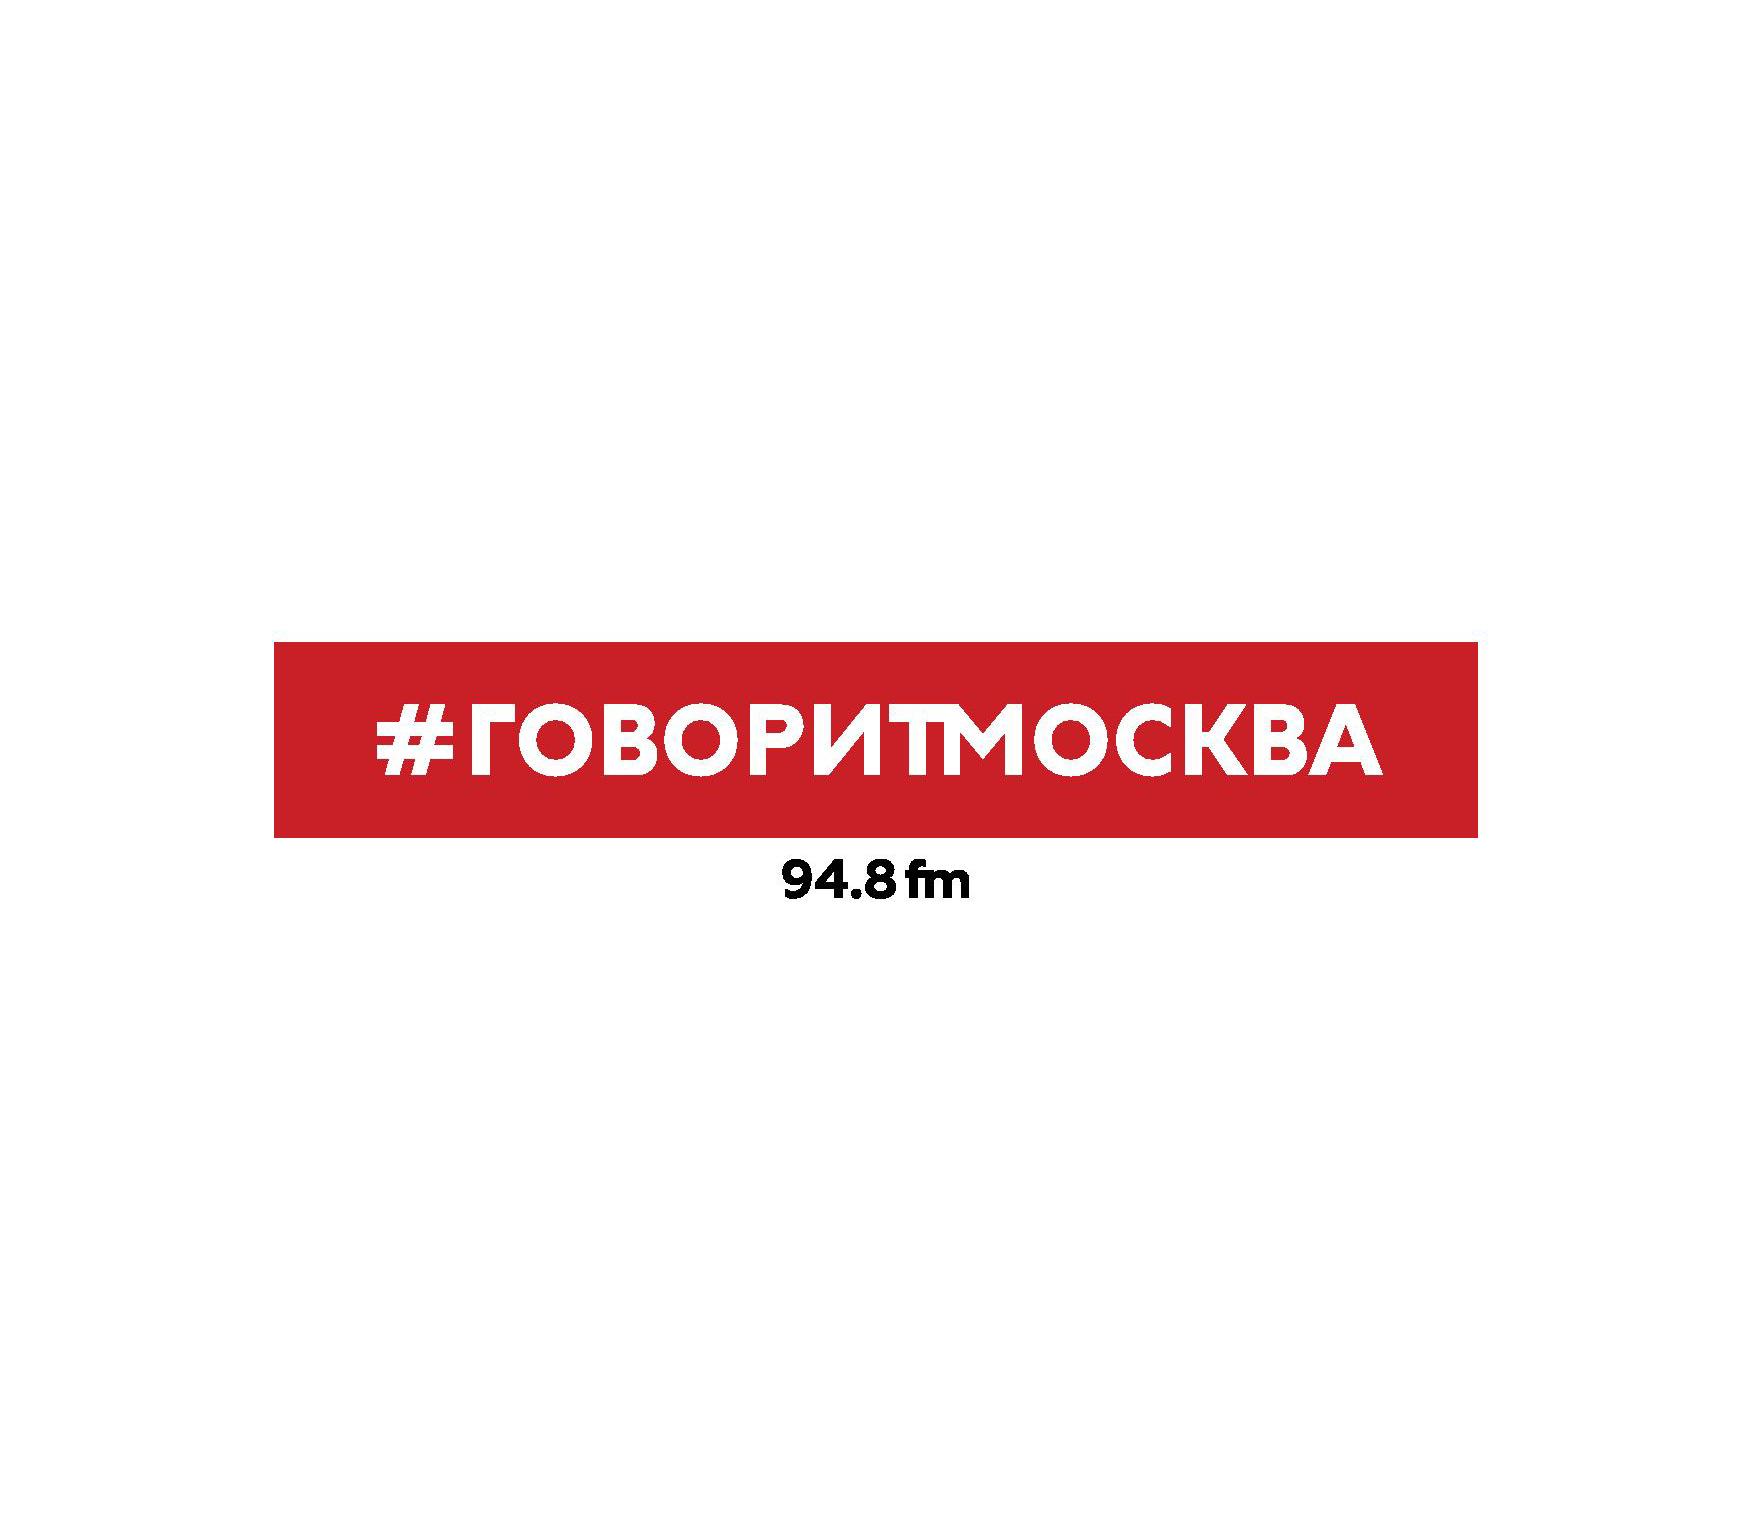 Станислав Симонов Эвакуация Москвы станислав симонов хитровка